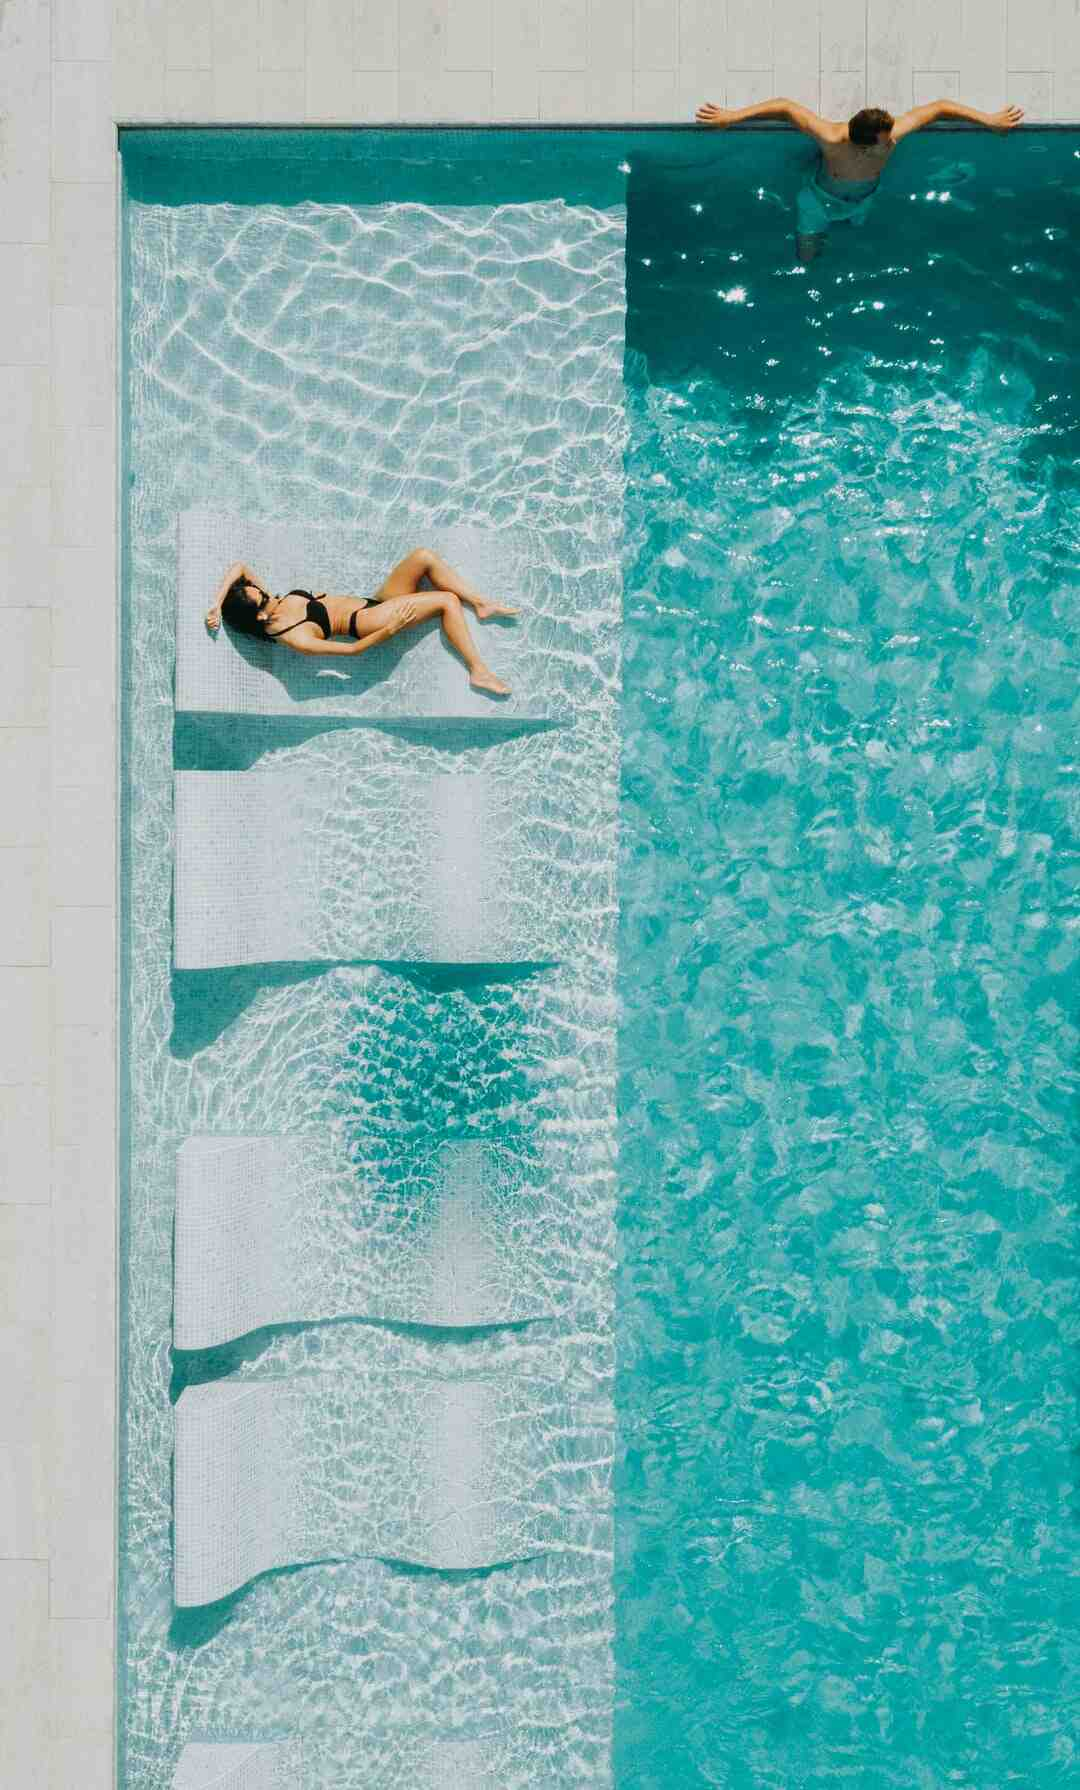 Comment vider une piscine hors sol